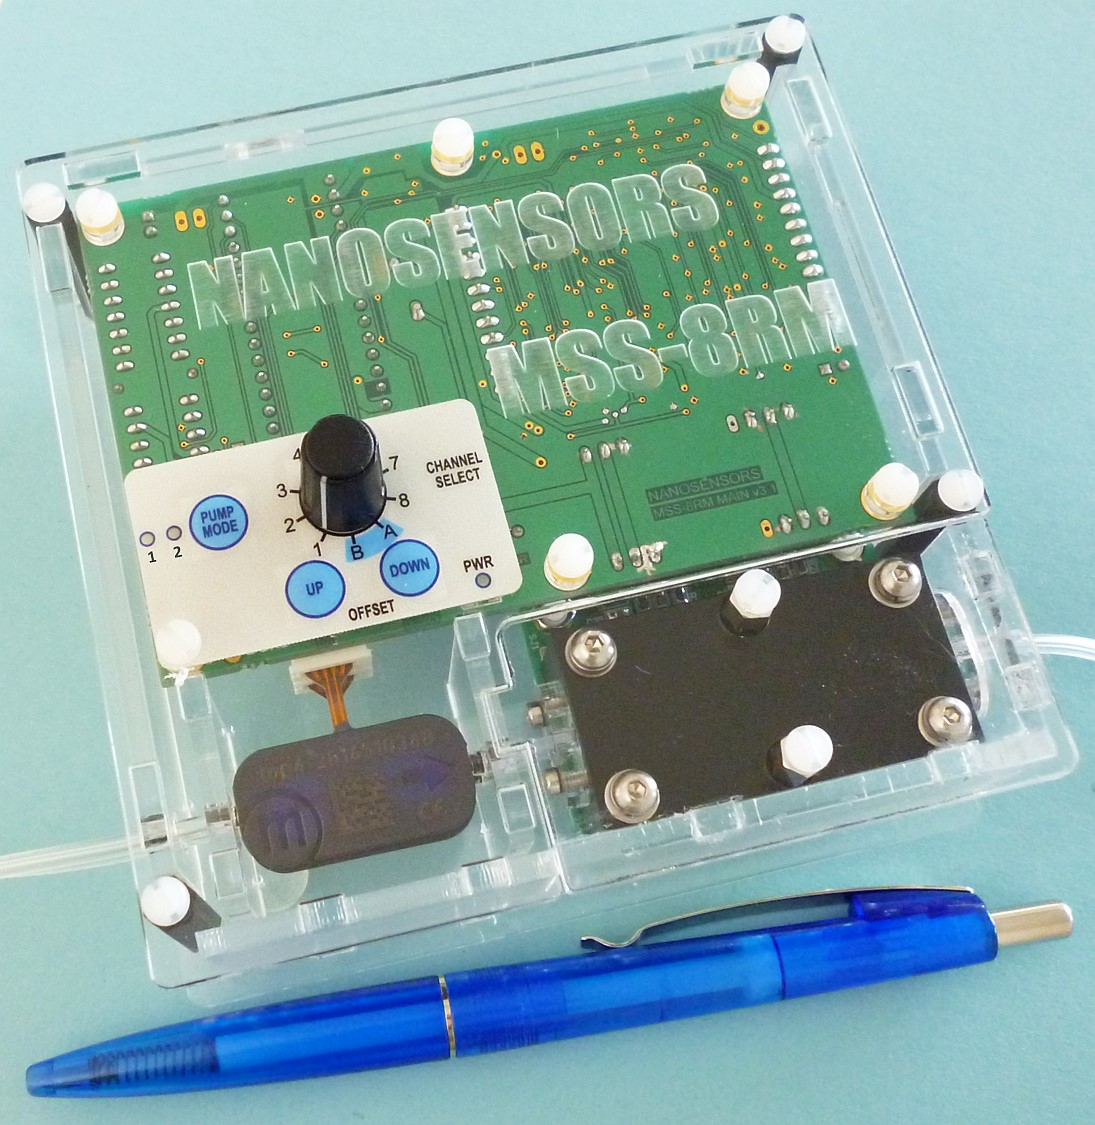 NANOSENSORS MSS-8RM - 8 Channel Readout Module for MSS Membrane-type Surface-stress Sensor